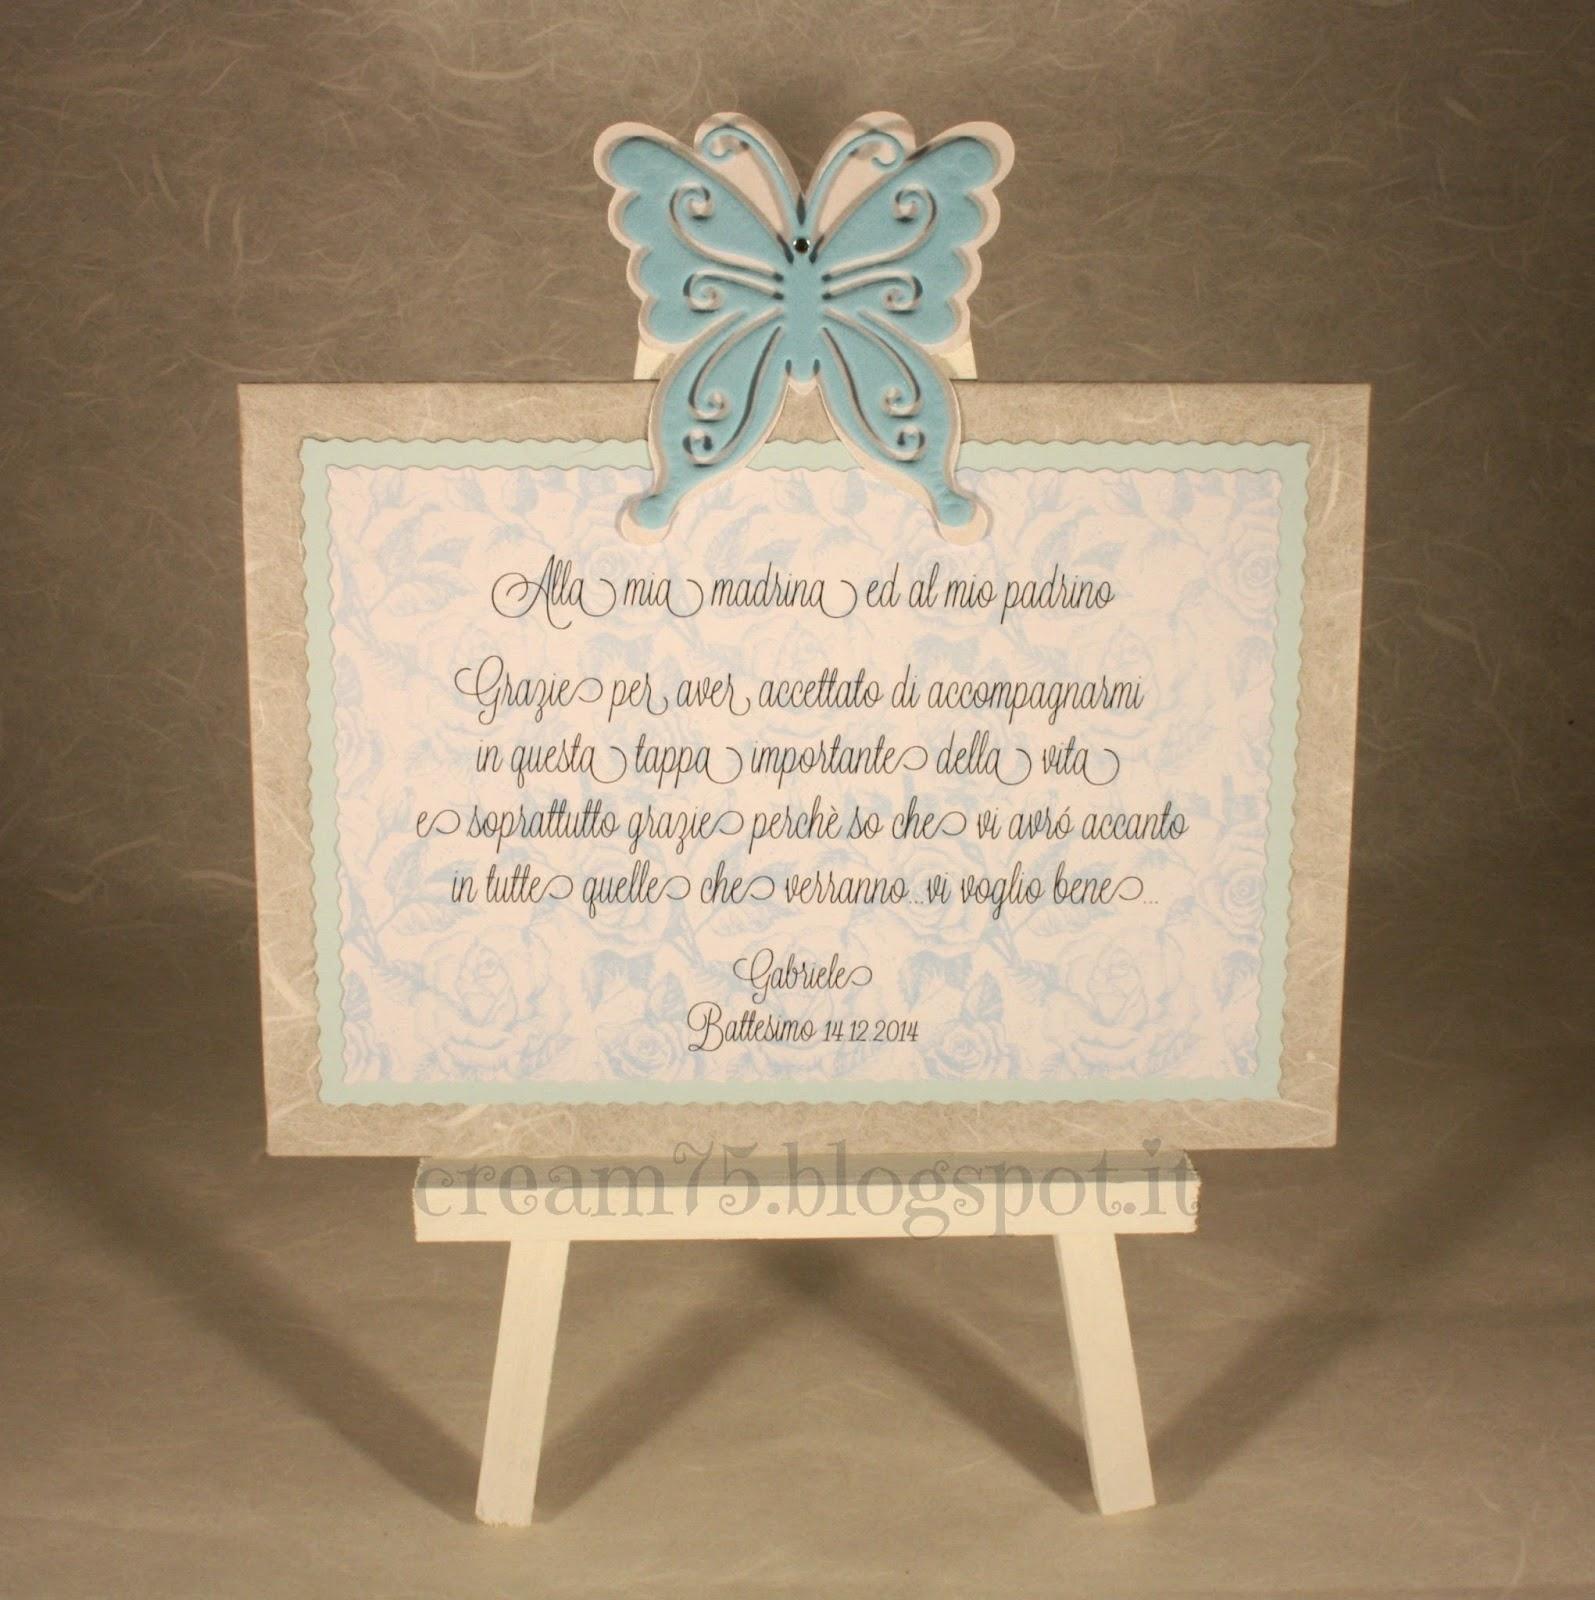 Ben noto Frasi Ringraziamento Battesimo SD91 » Regardsdefemmes CJ18